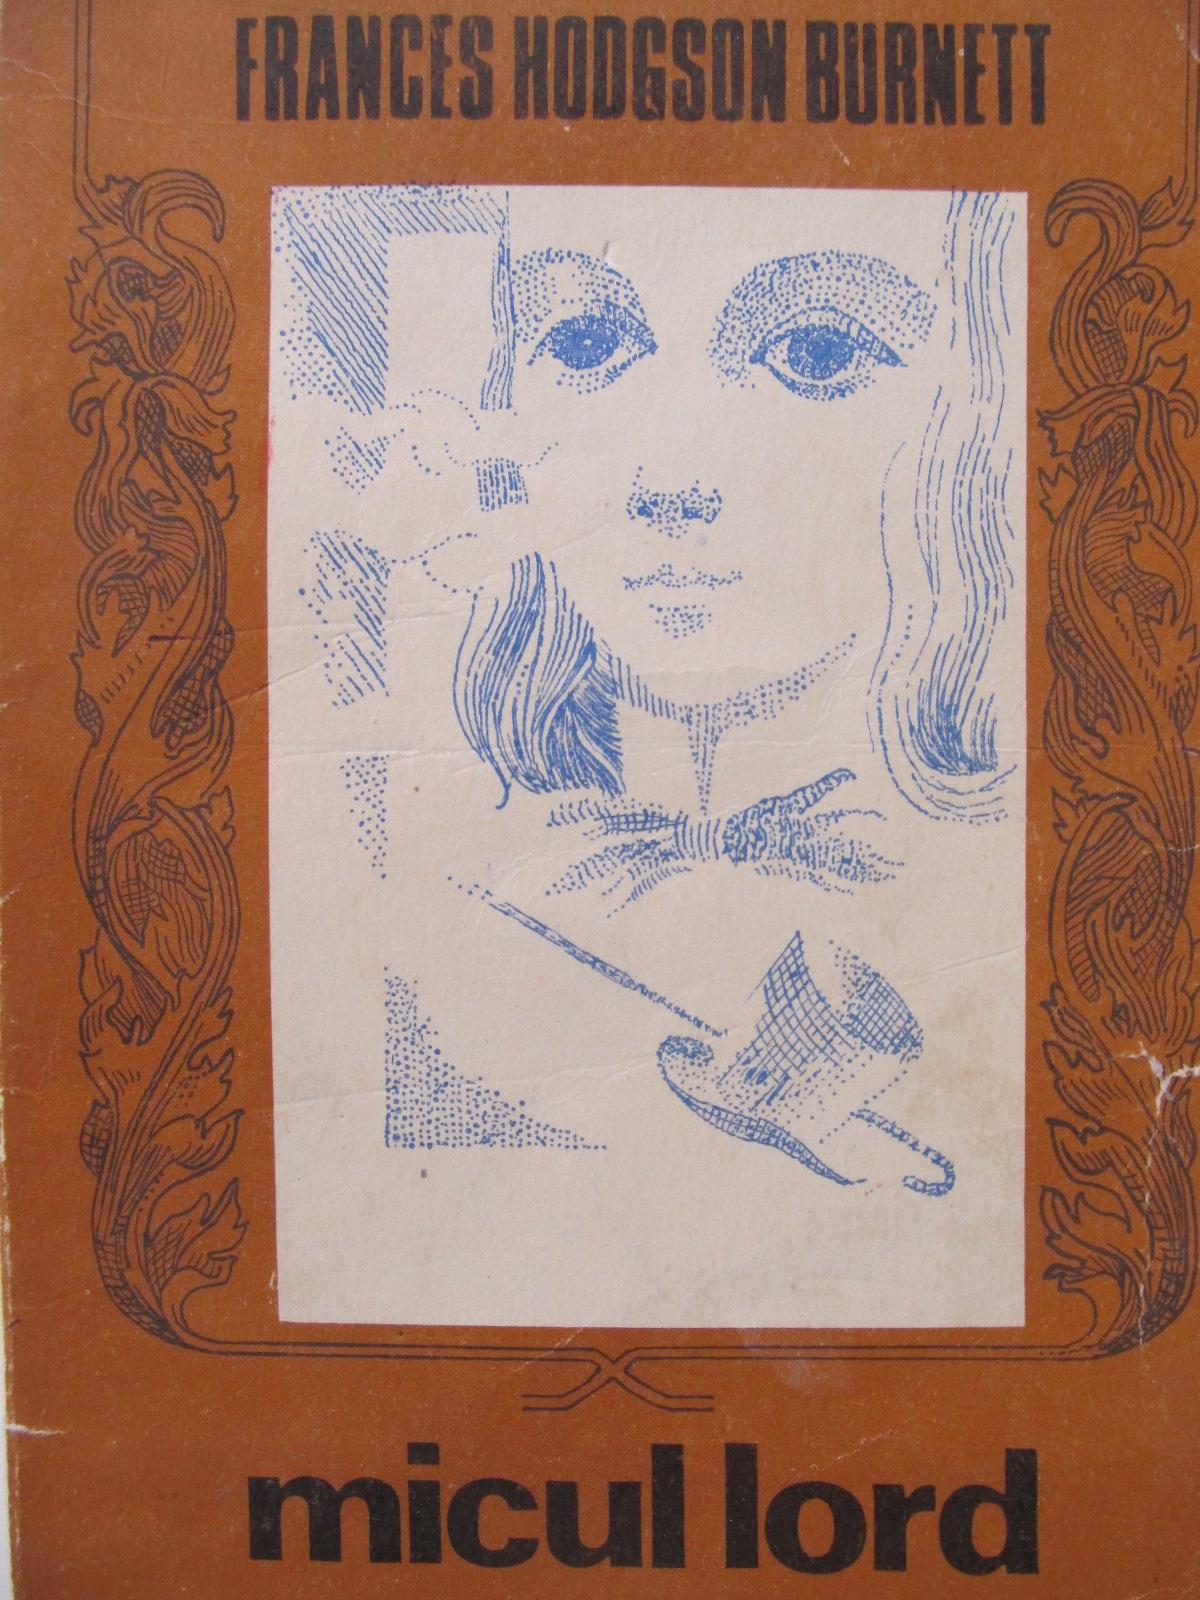 Micul lord - Frances Hodgson Burnett | Detalii carte